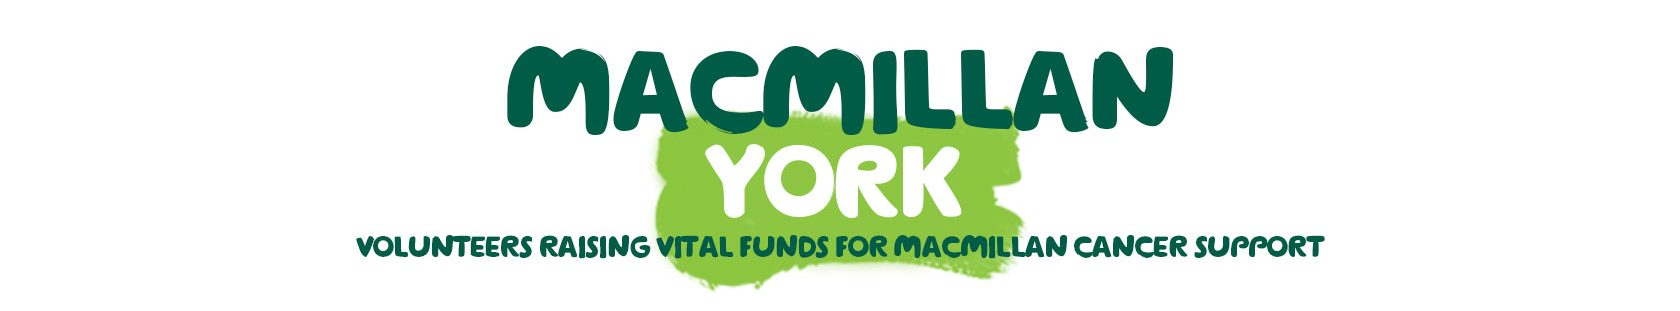 Macmillan York